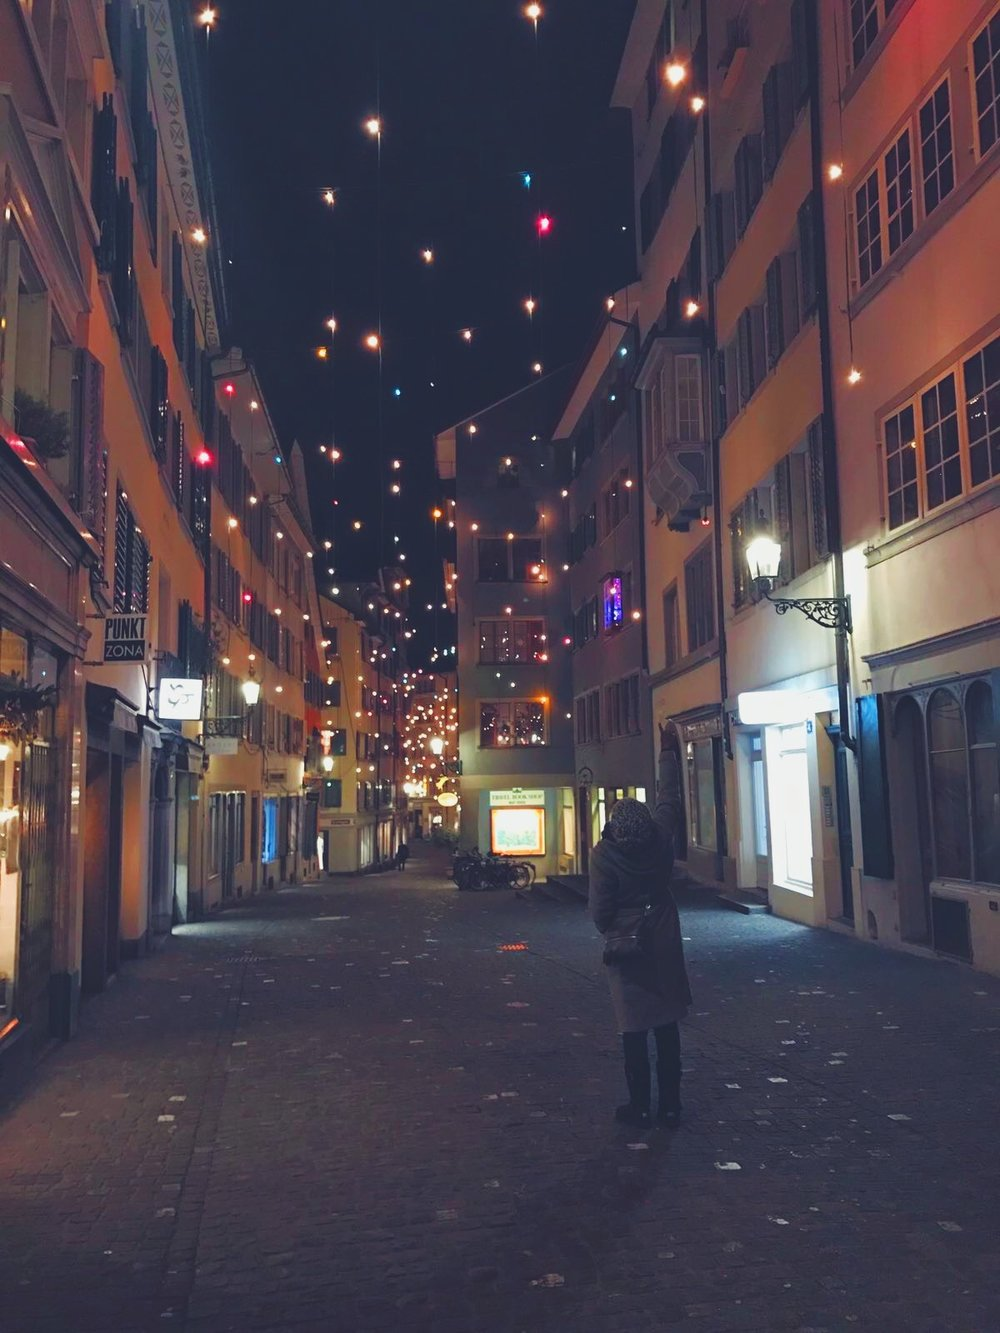 Admiring what Zurich has to offer